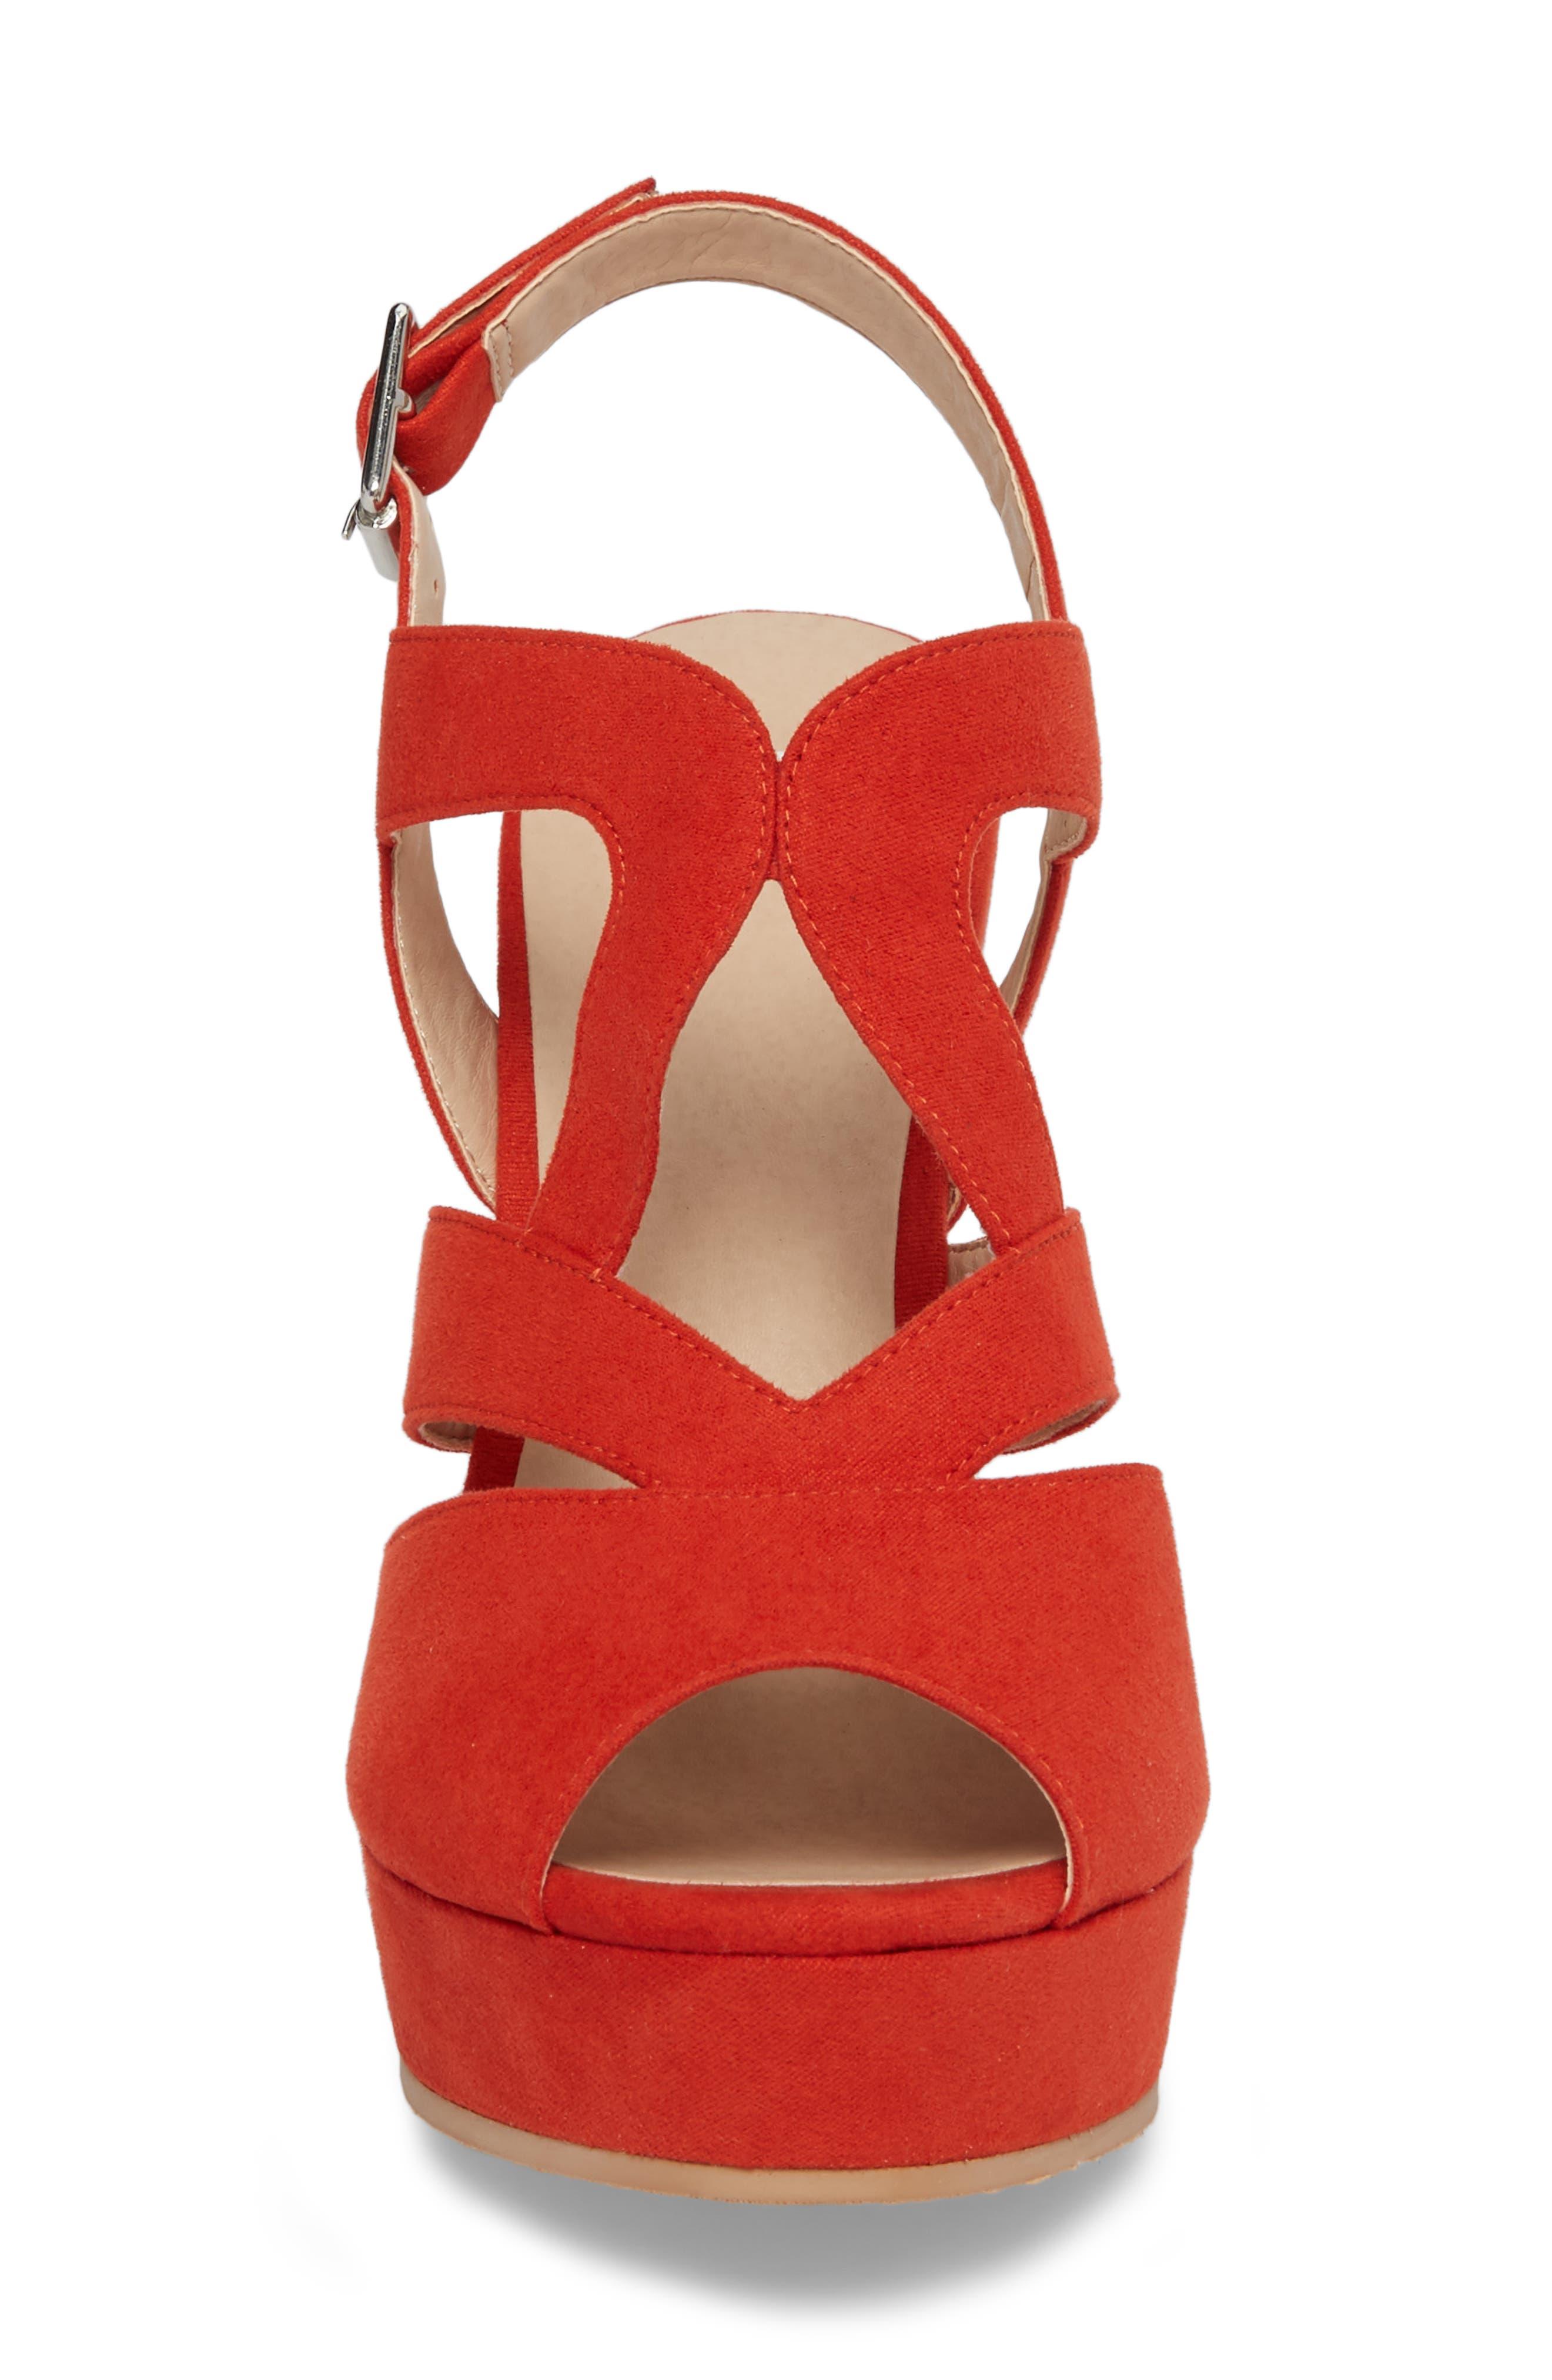 Sunny Platform Wedge Sandal,                             Alternate thumbnail 24, color,